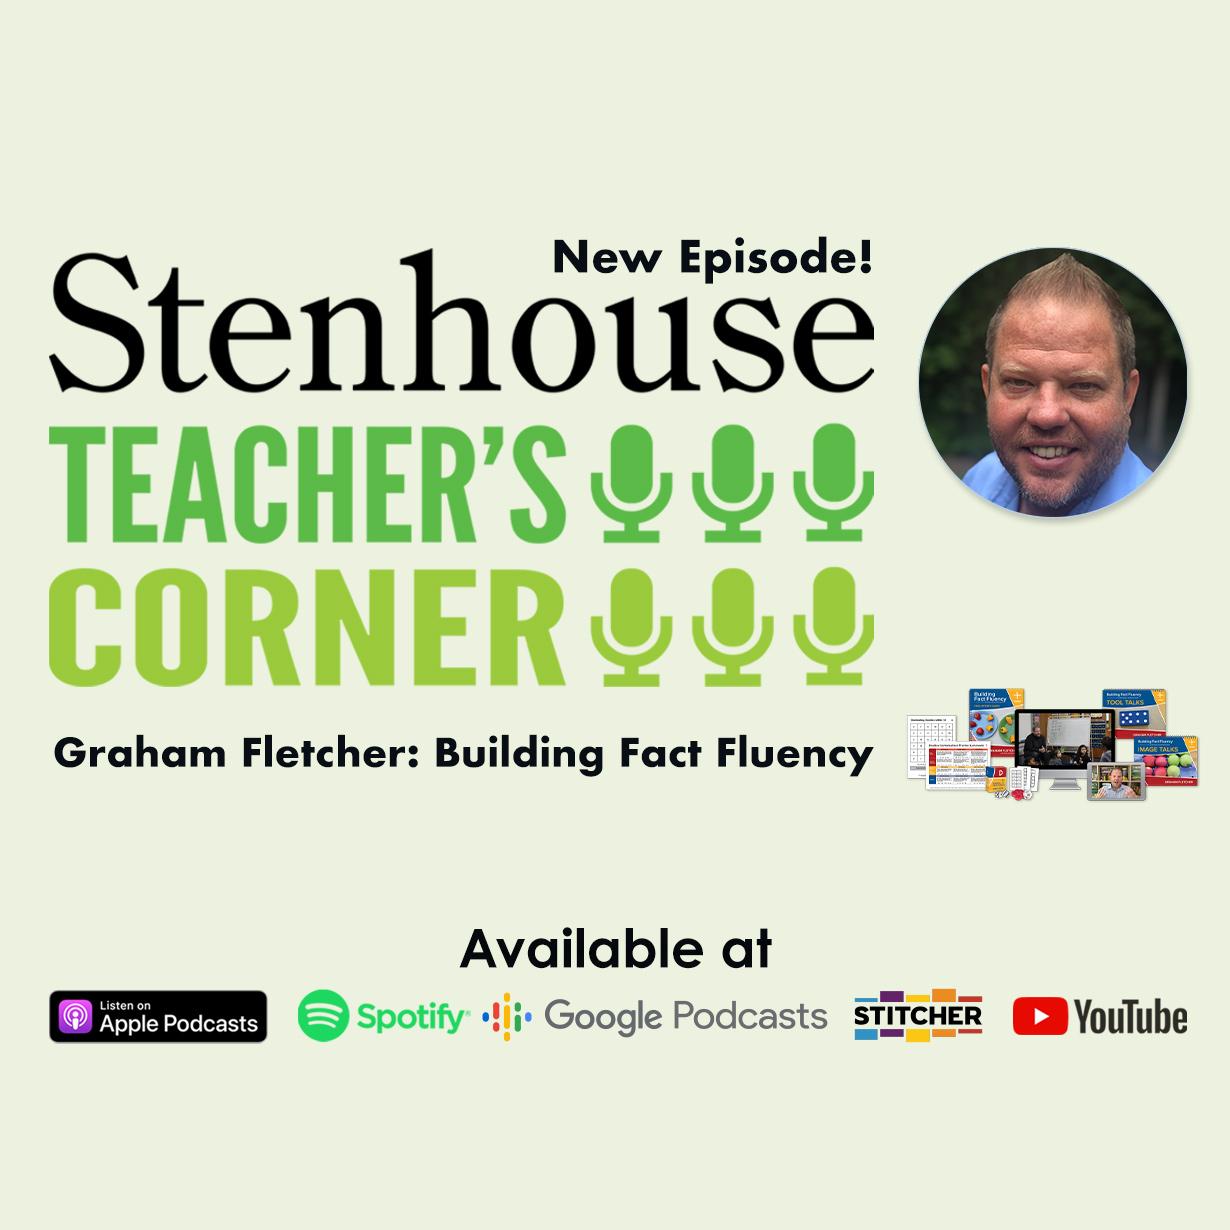 PODCAST: Graham Fletcher on Building Fact Fluency